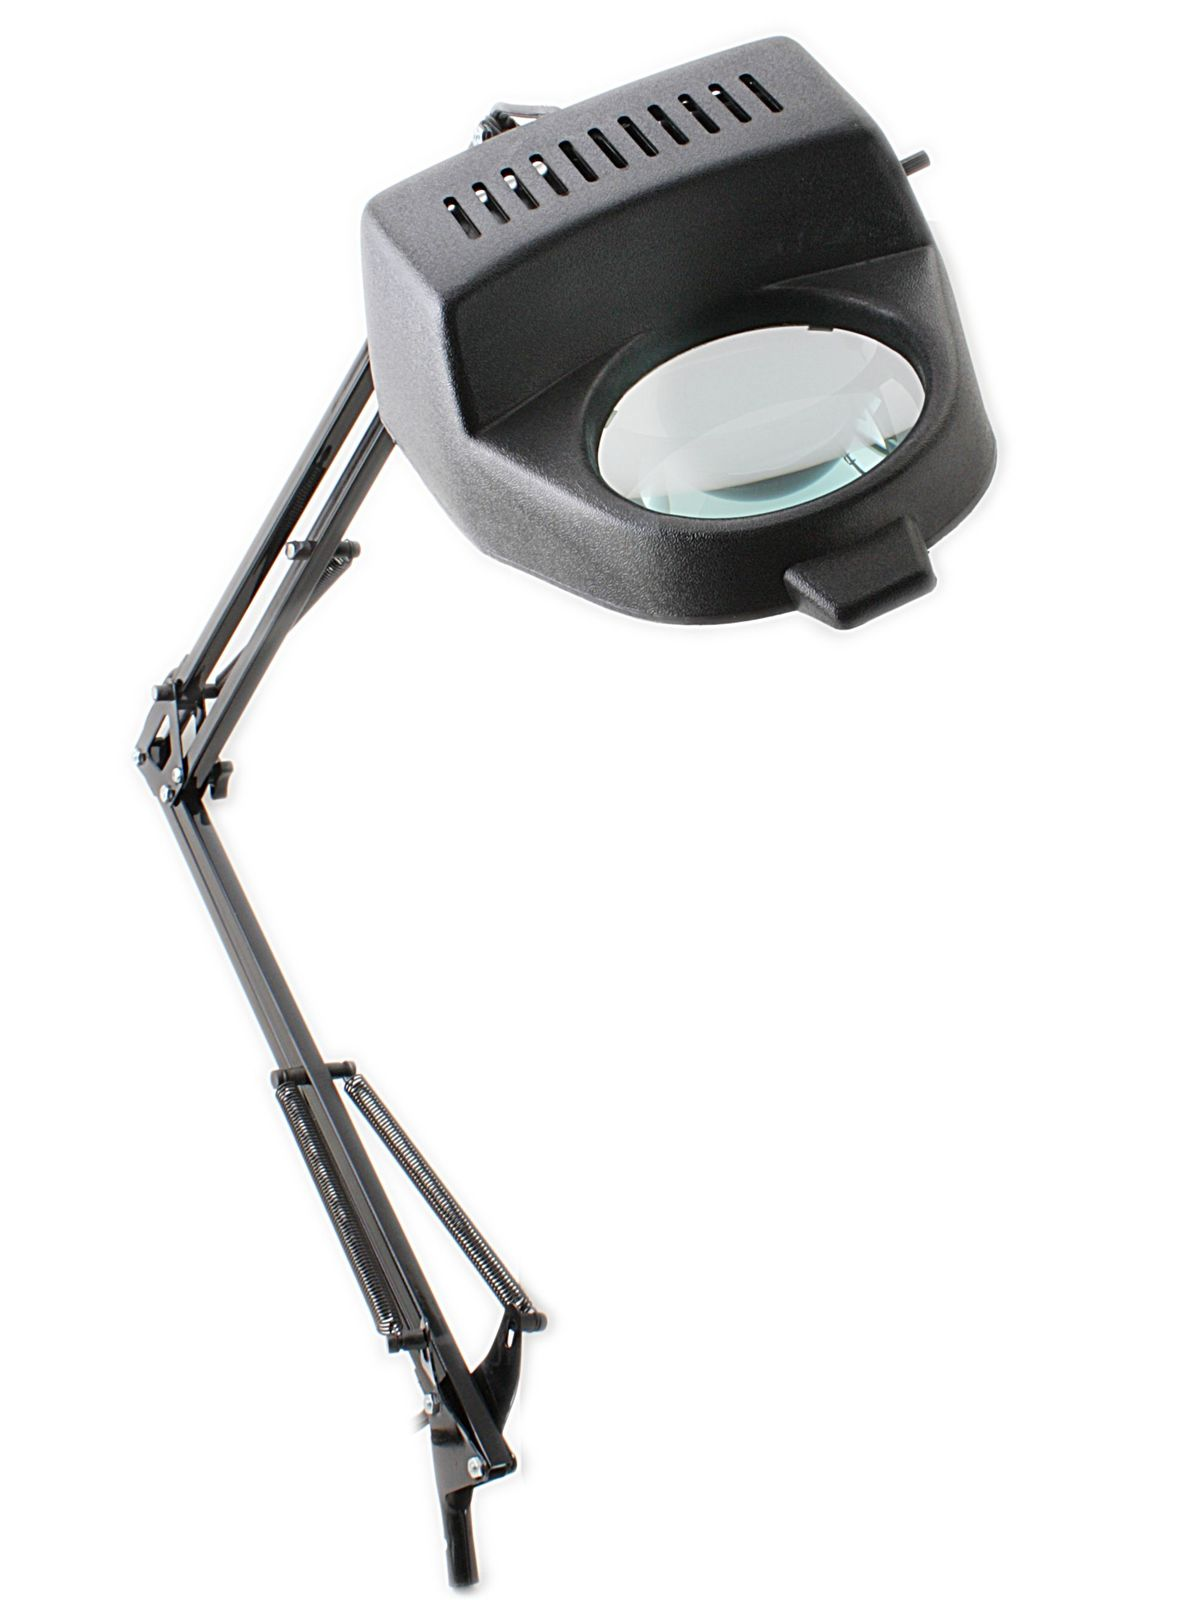 Magnifier Incandescent Lamp